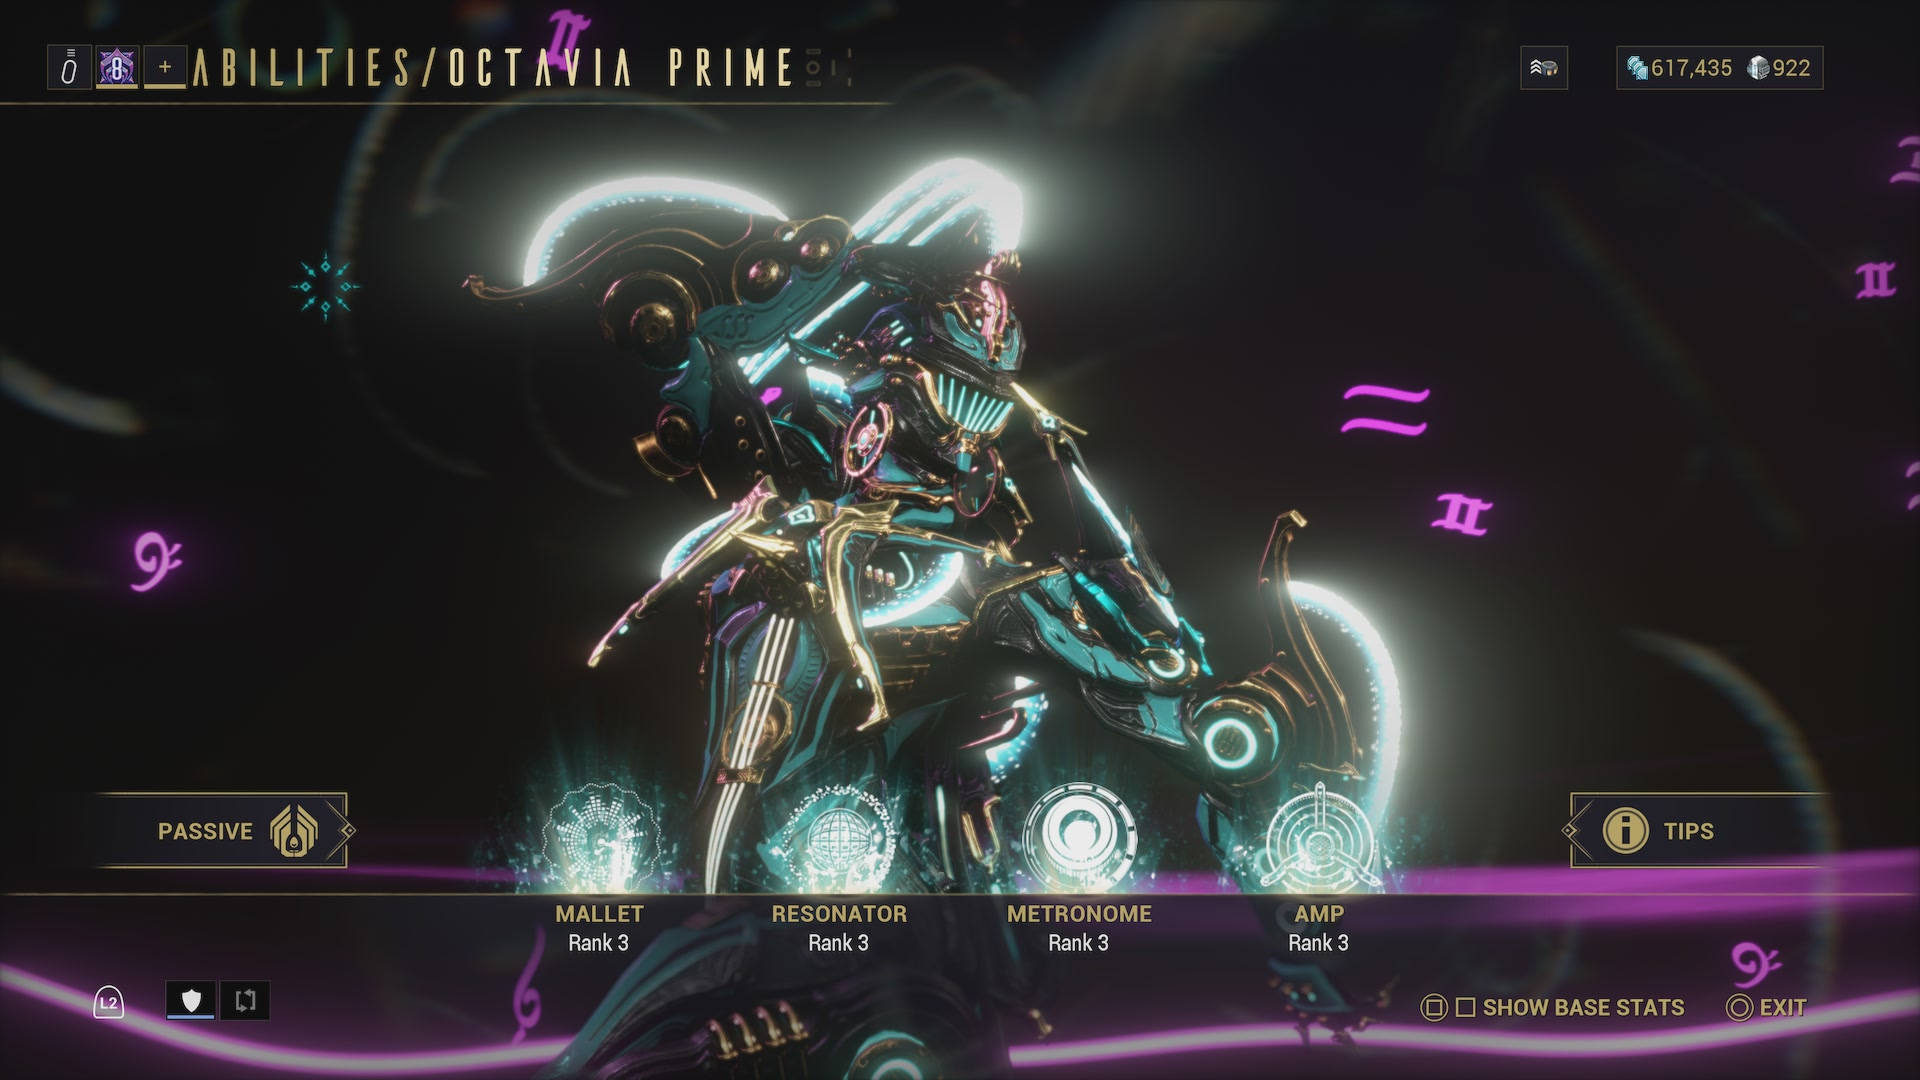 Warframe Octavia Prime Access